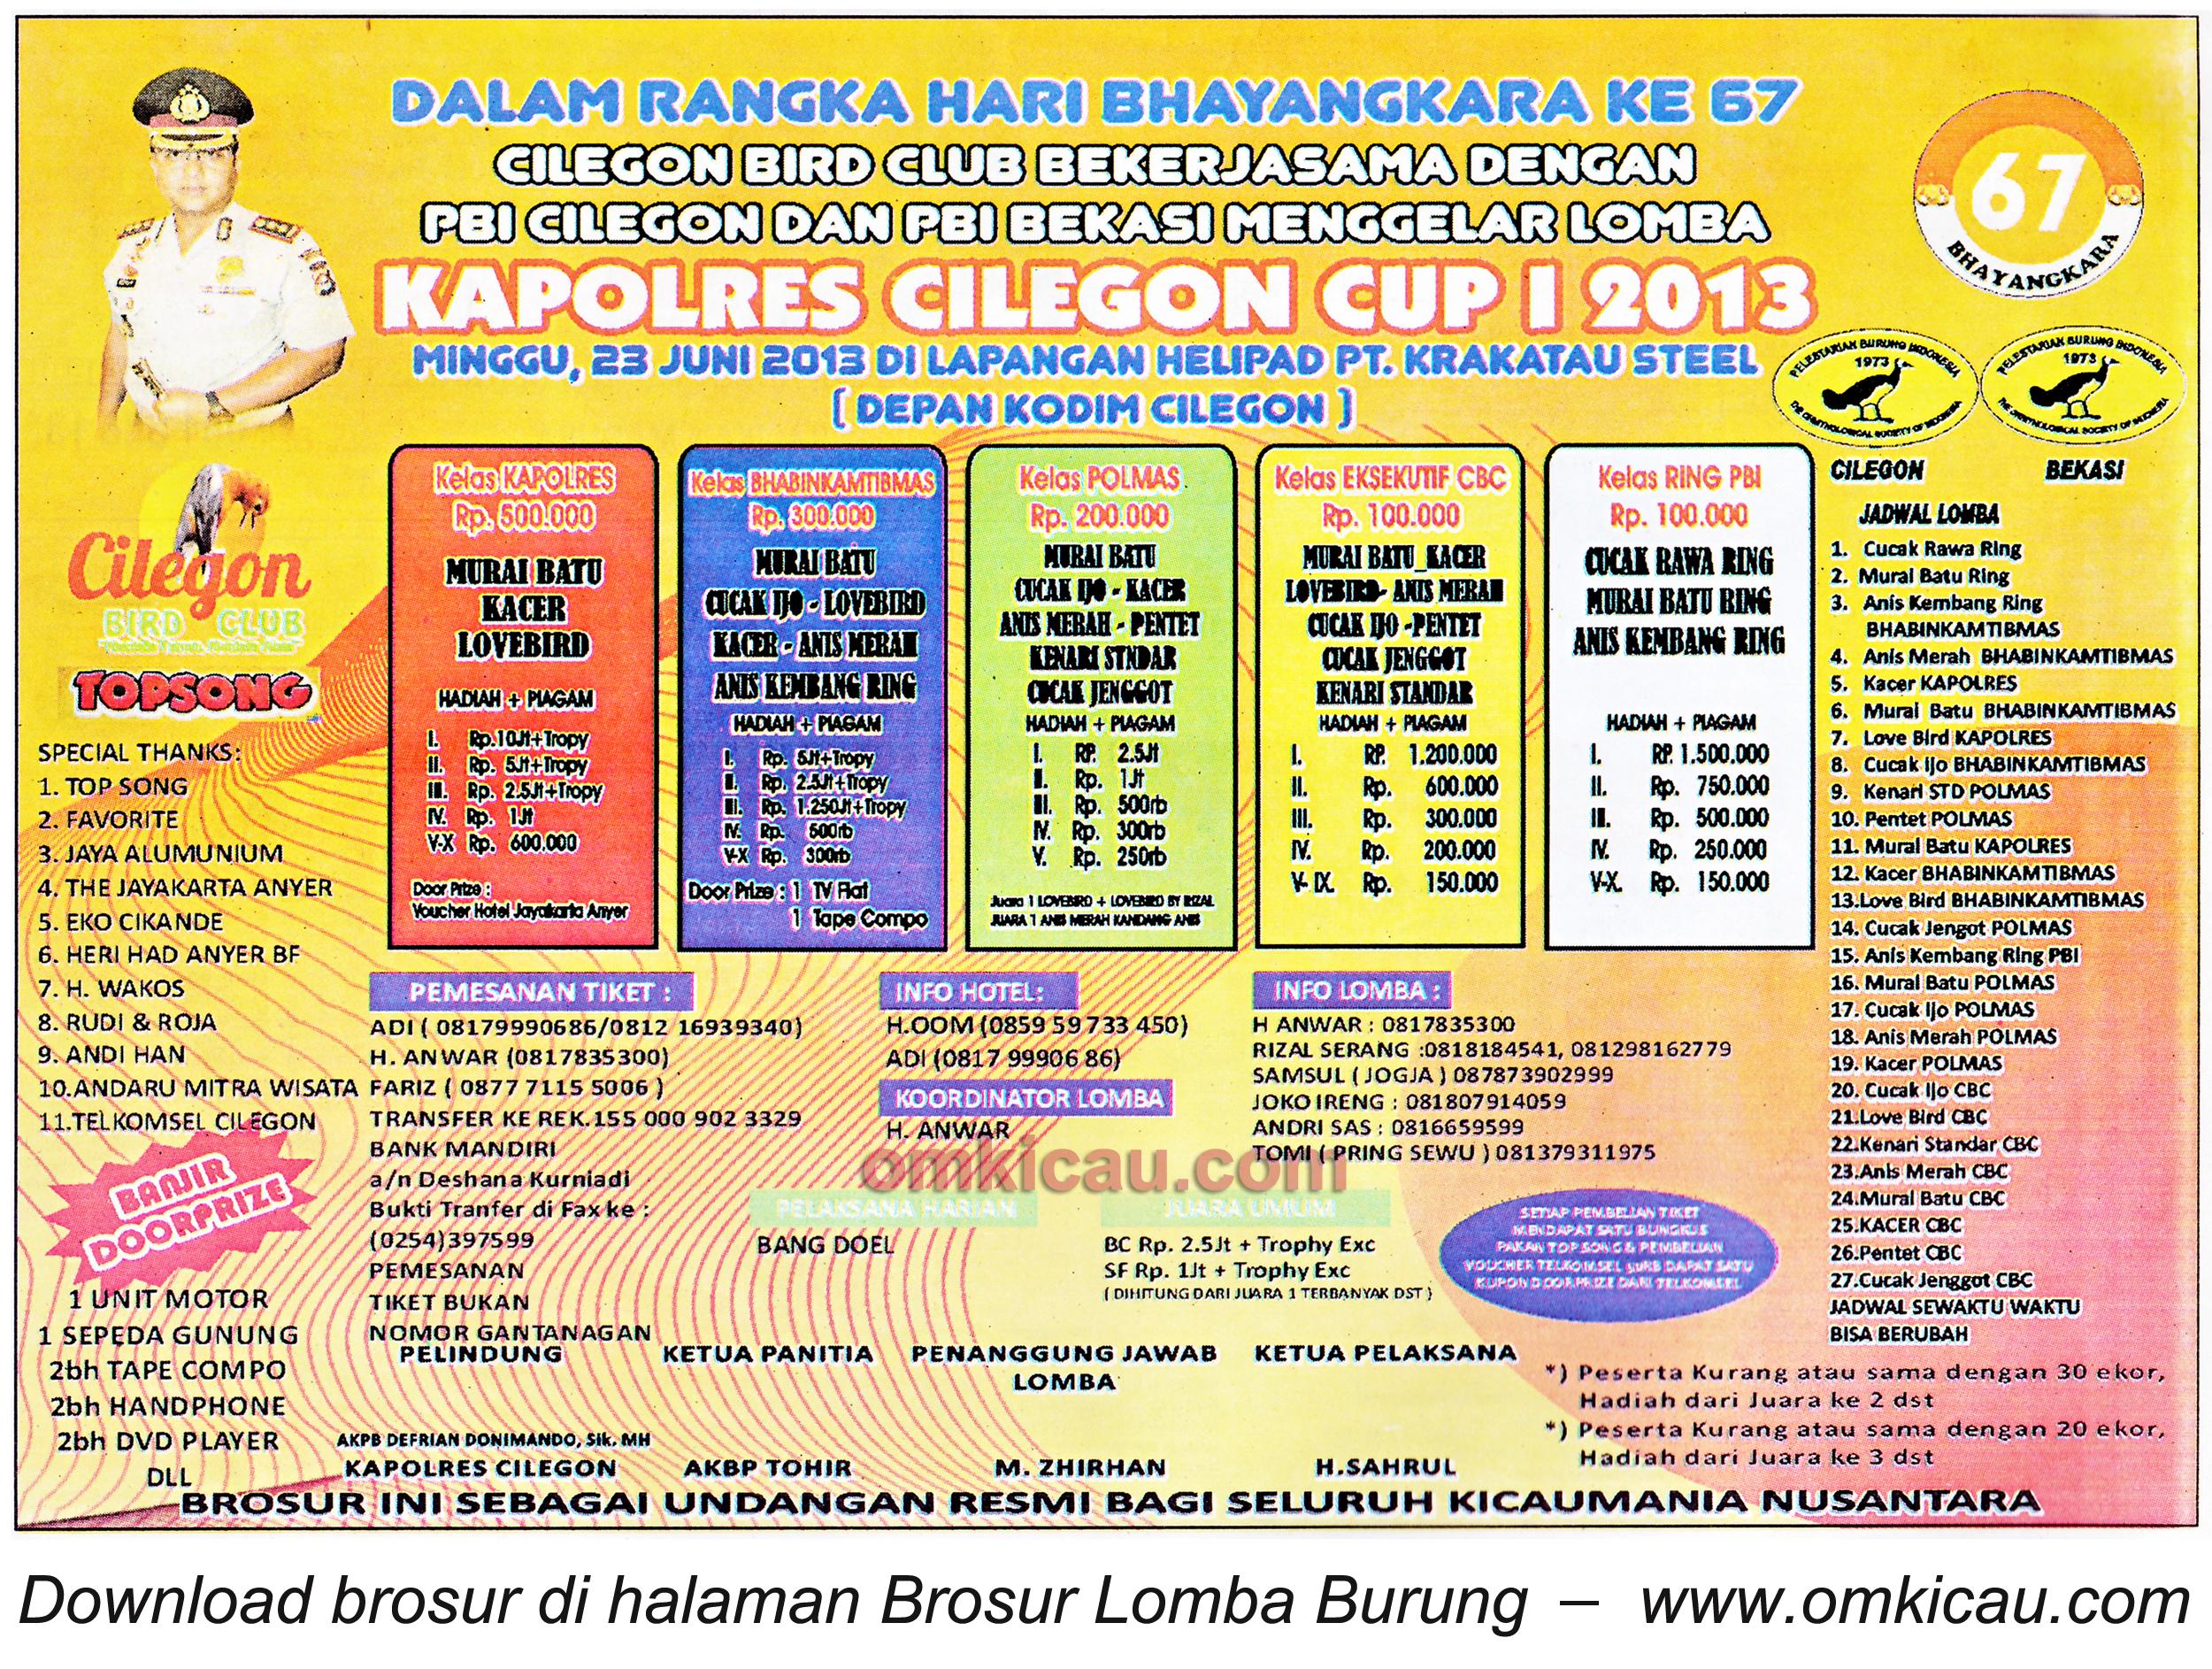 Brosur Lomba Burung Kapolres Cup Cilegon 23 Juni 2013